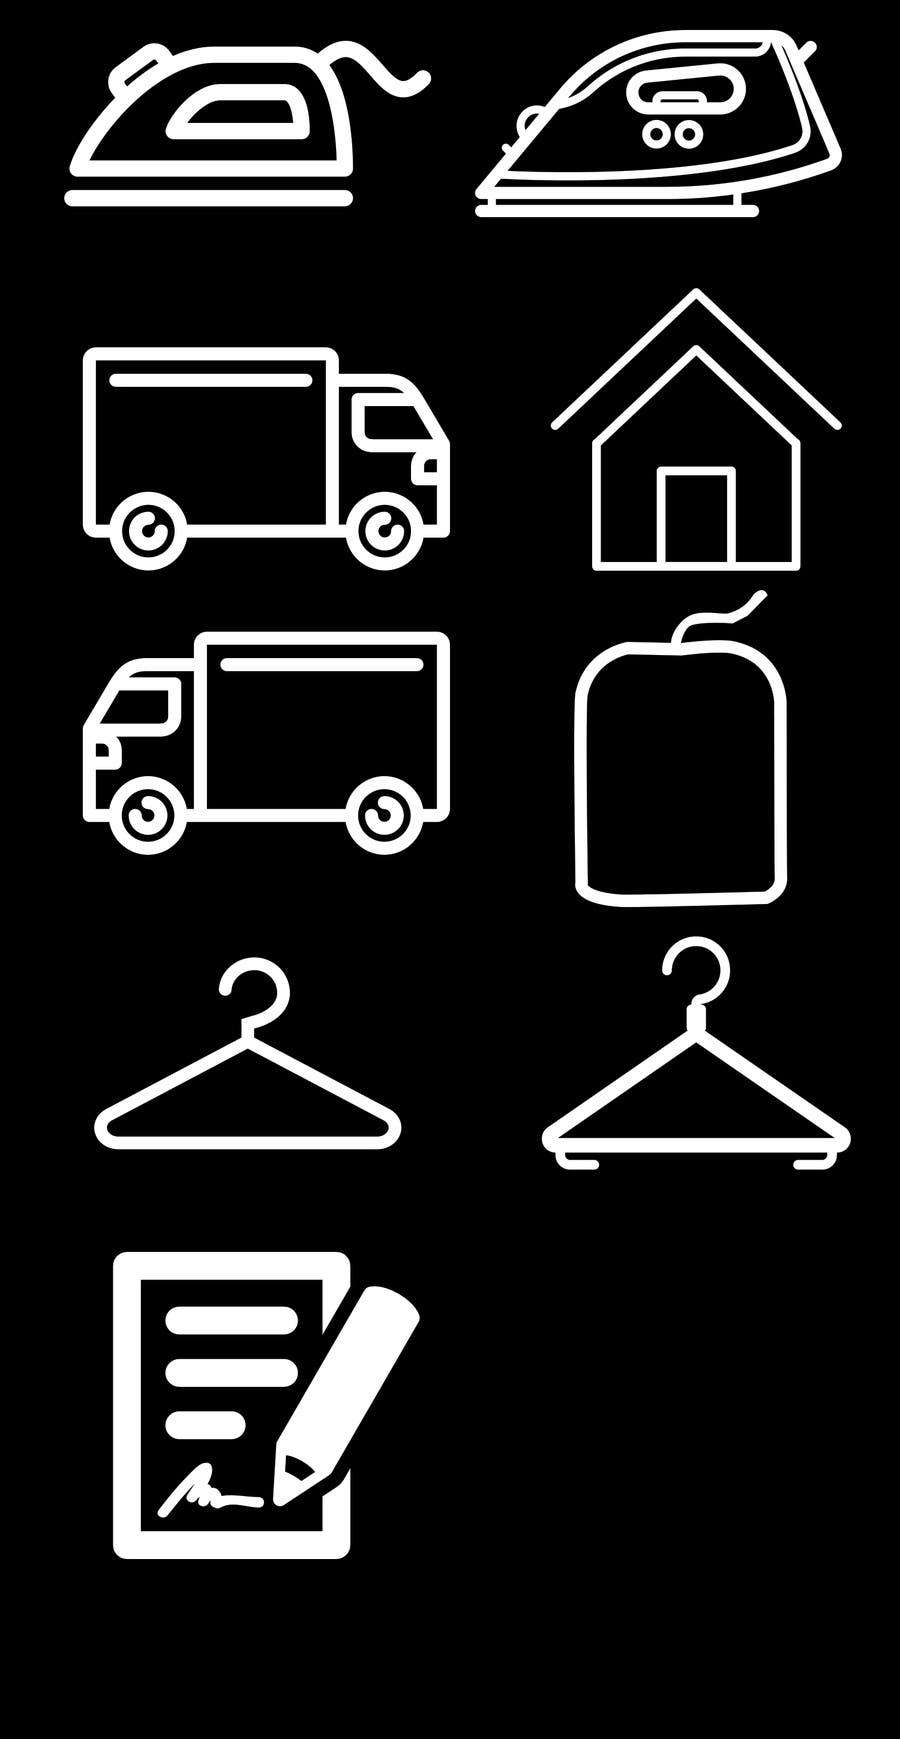 Proposition n°7 du concours Design some Icons